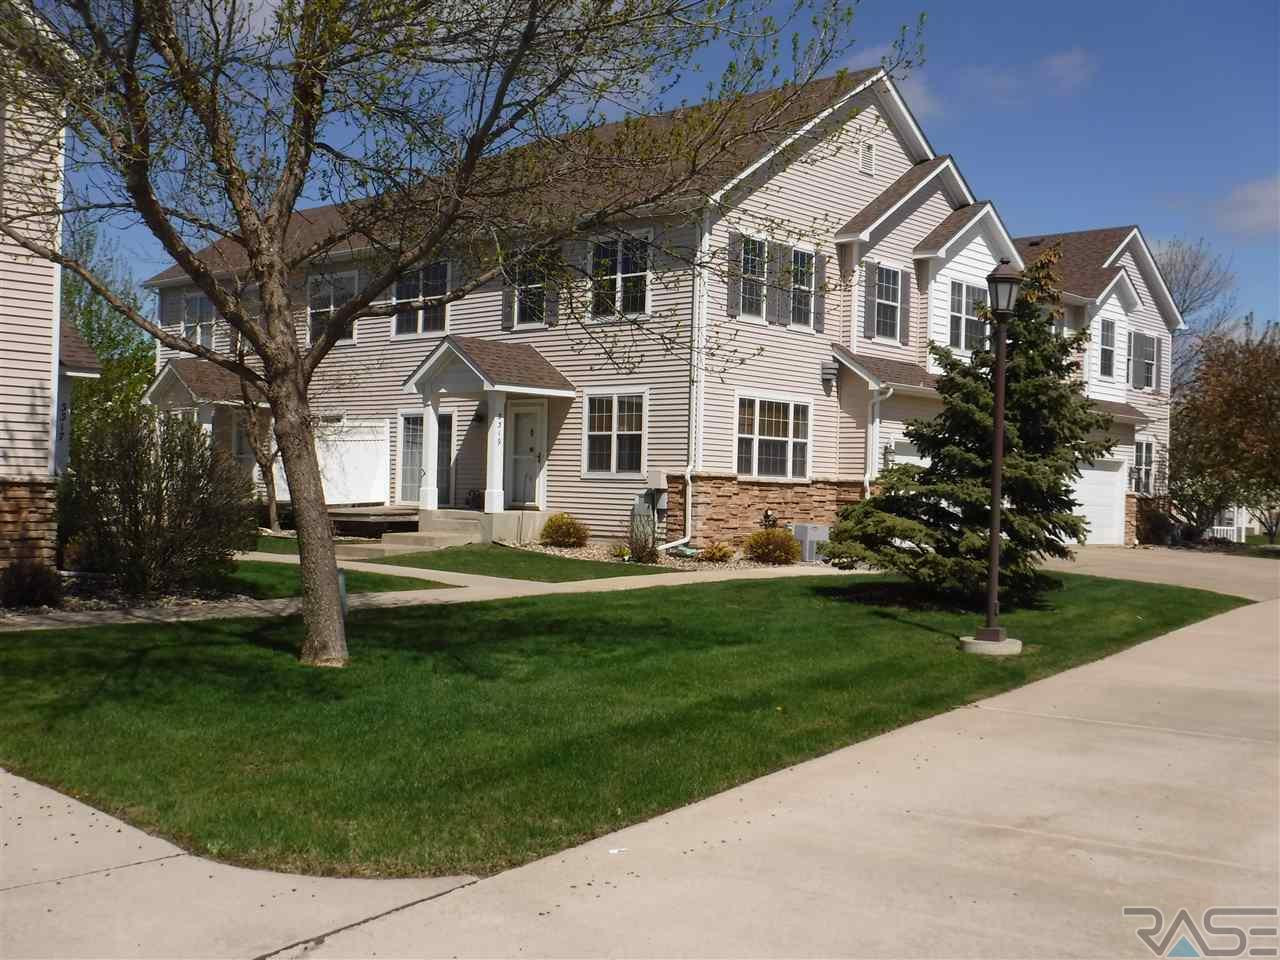 3319 W Ralph Rogers Rd, Sioux Falls, SD 57108